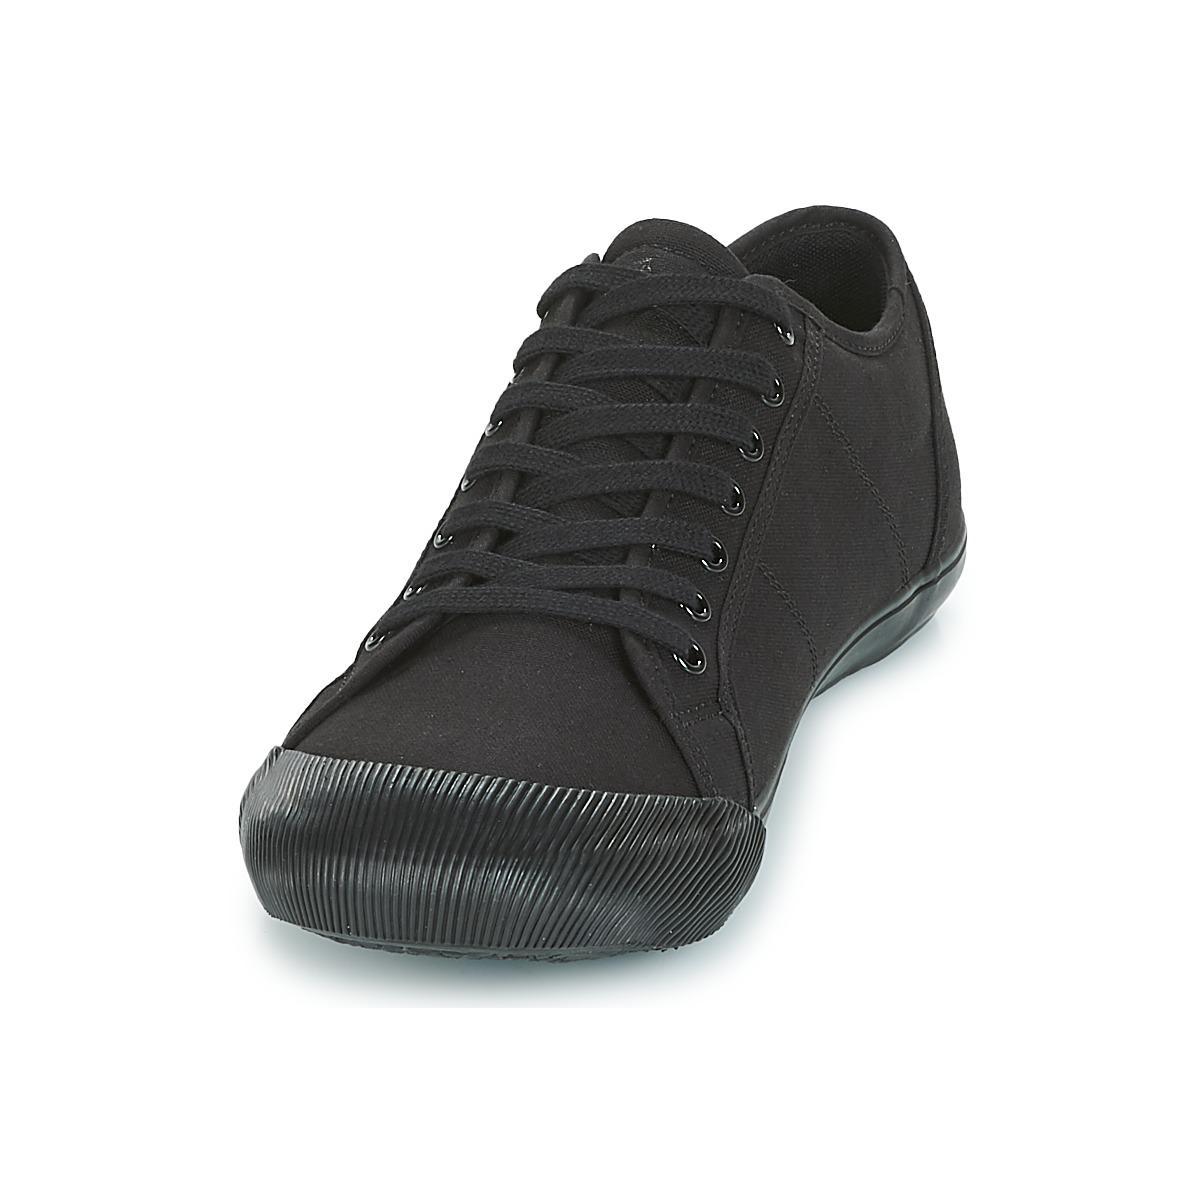 3168a882e4e6 Le Coq Sportif - Deauville-sport Women s Shoes (trainers) In Black - Lyst.  View fullscreen